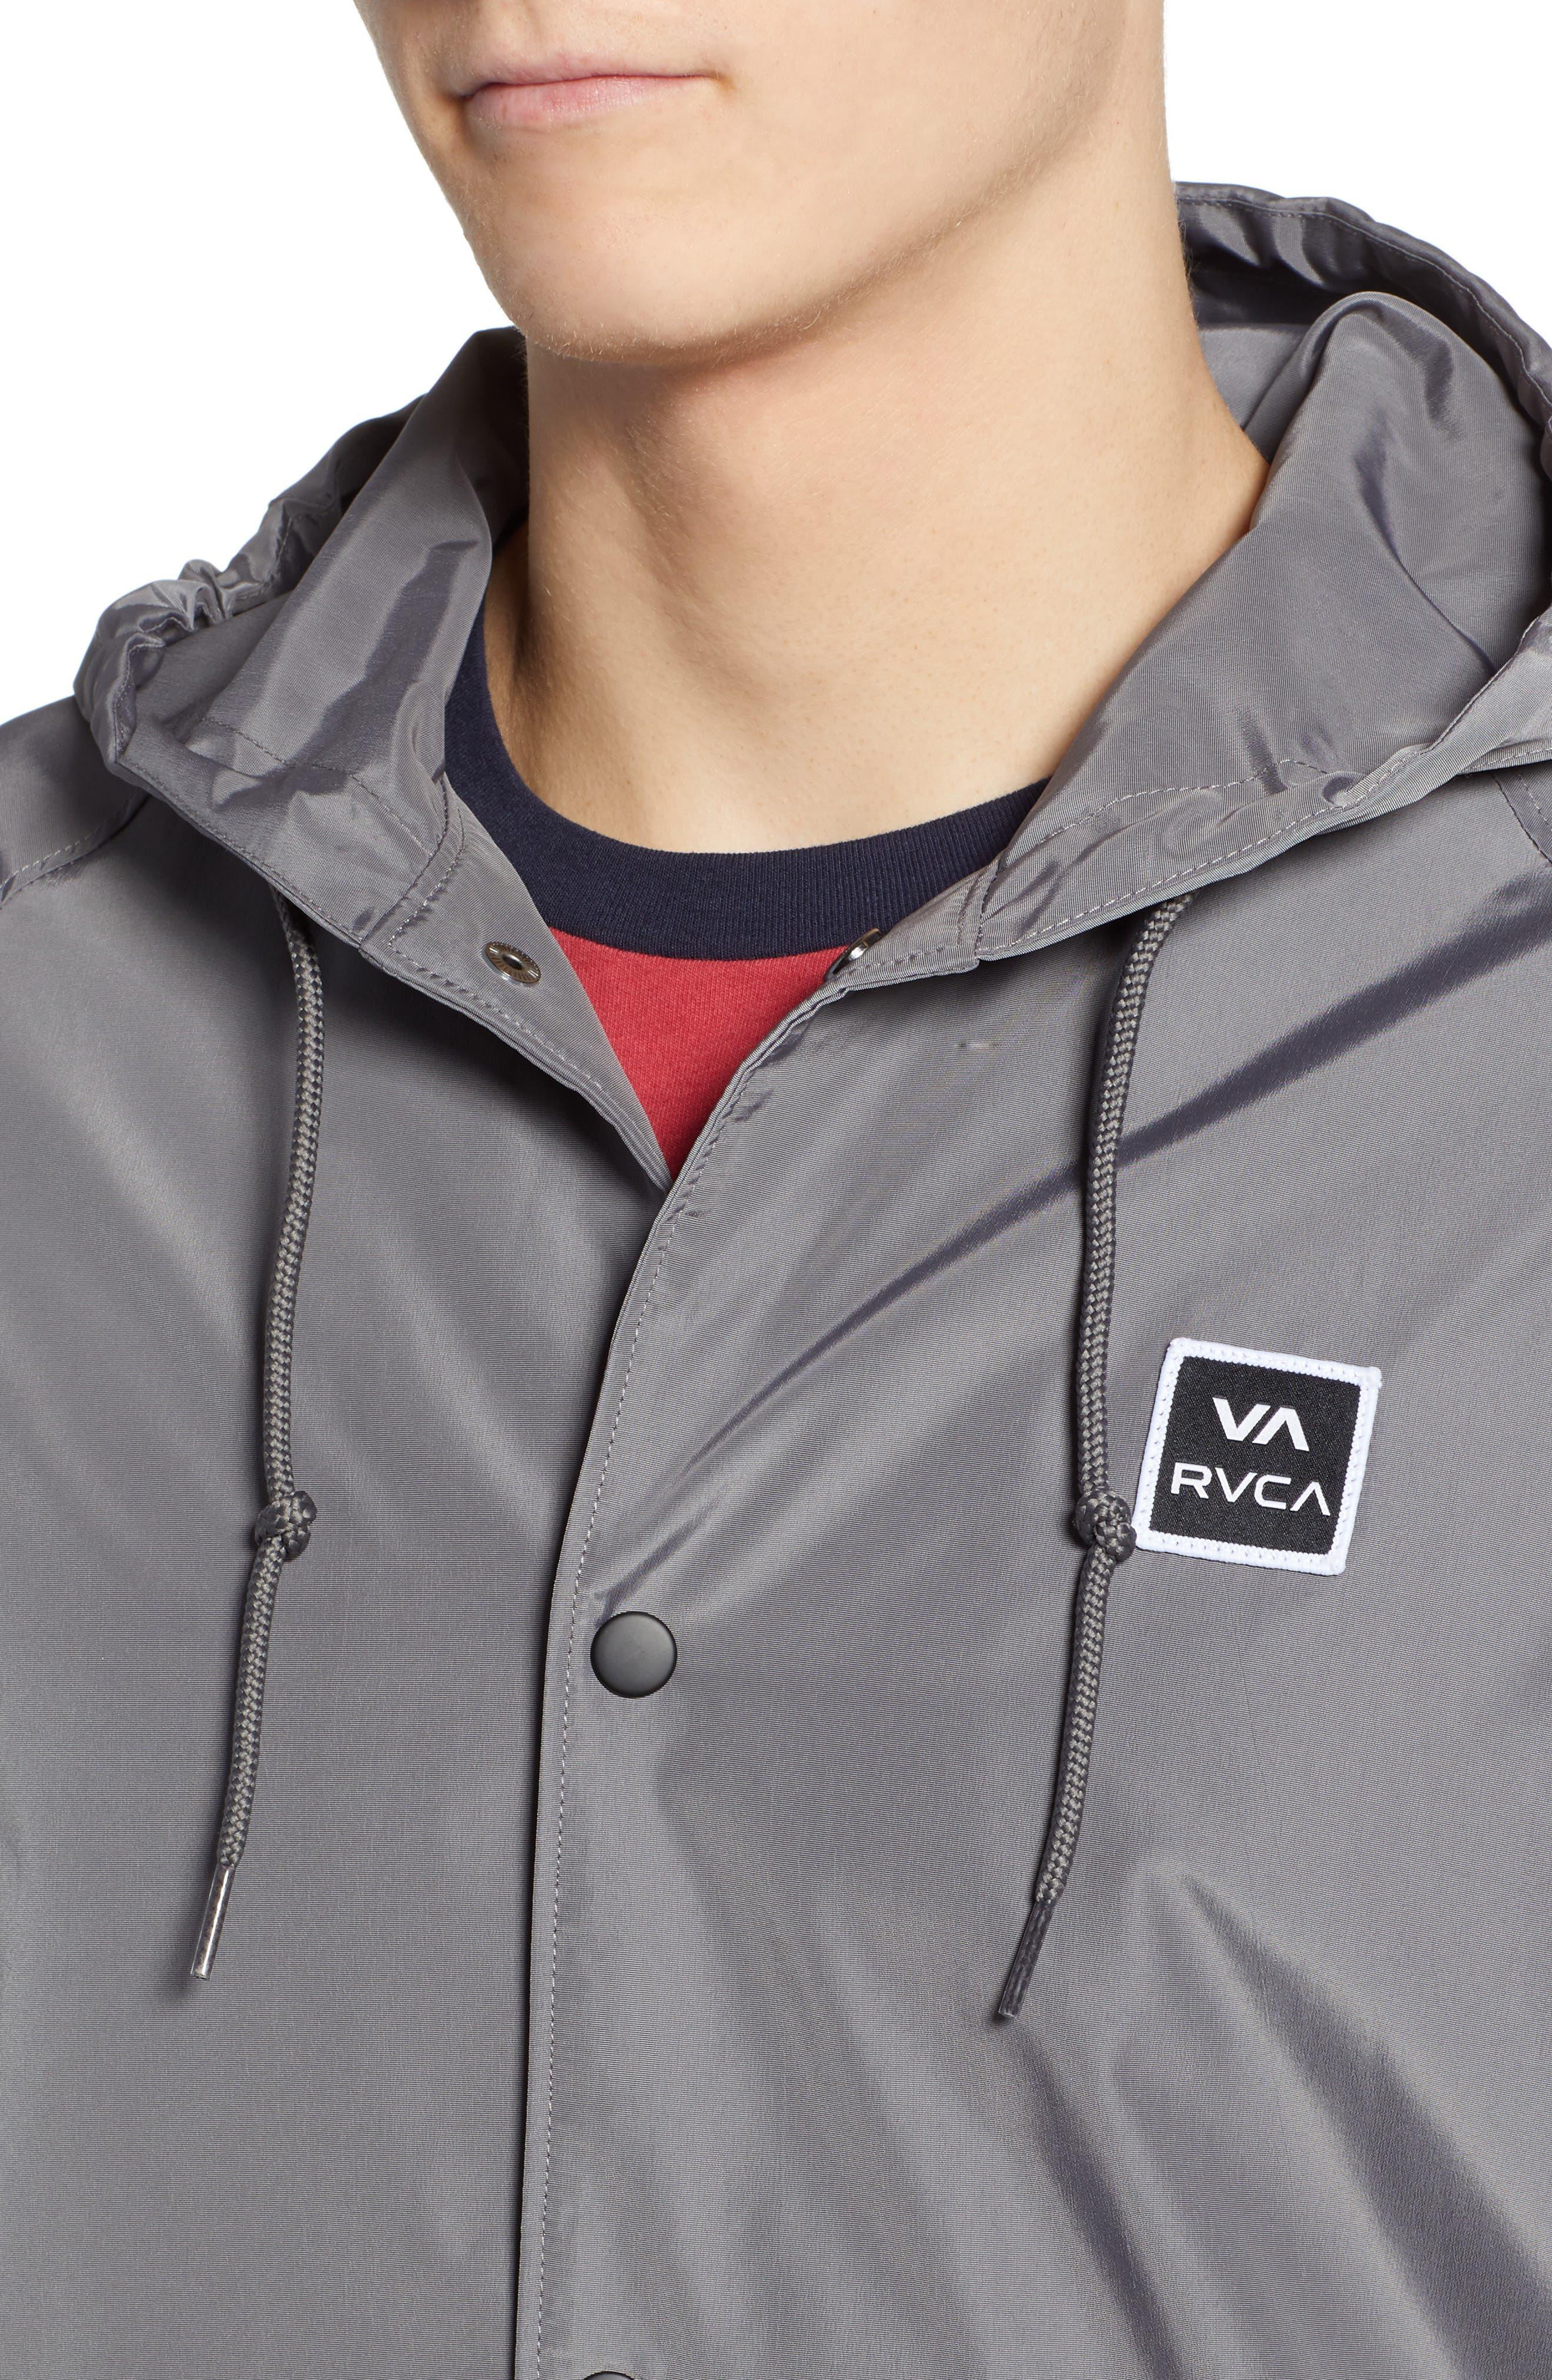 RVCA, VA Hooded Coach's Jacket, Alternate thumbnail 5, color, 026